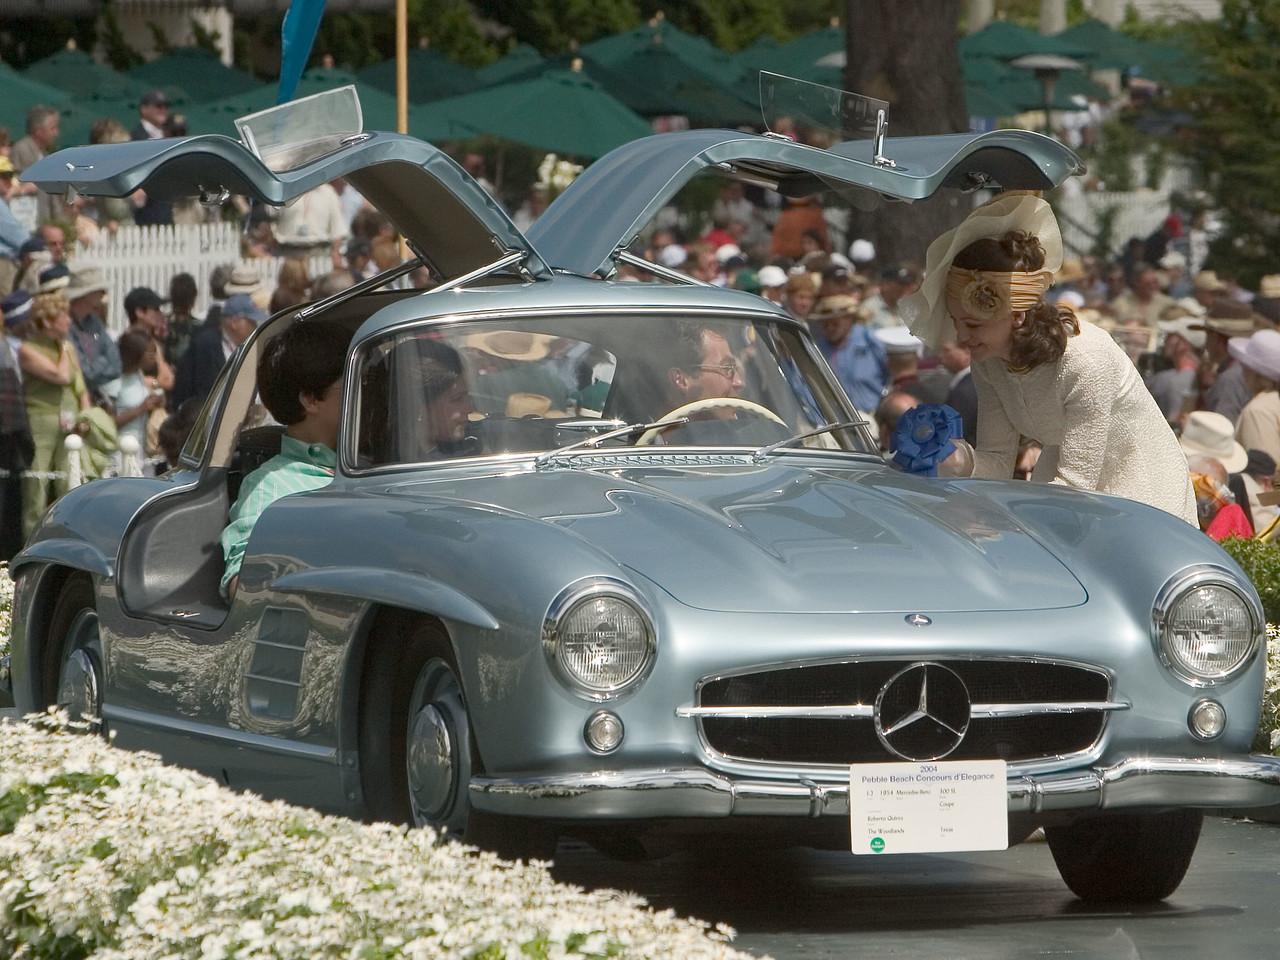 1954 Mercedes-Benz 300 SL Coupe. 1st Mercedes 300 SL.  Roberto Quiroz.